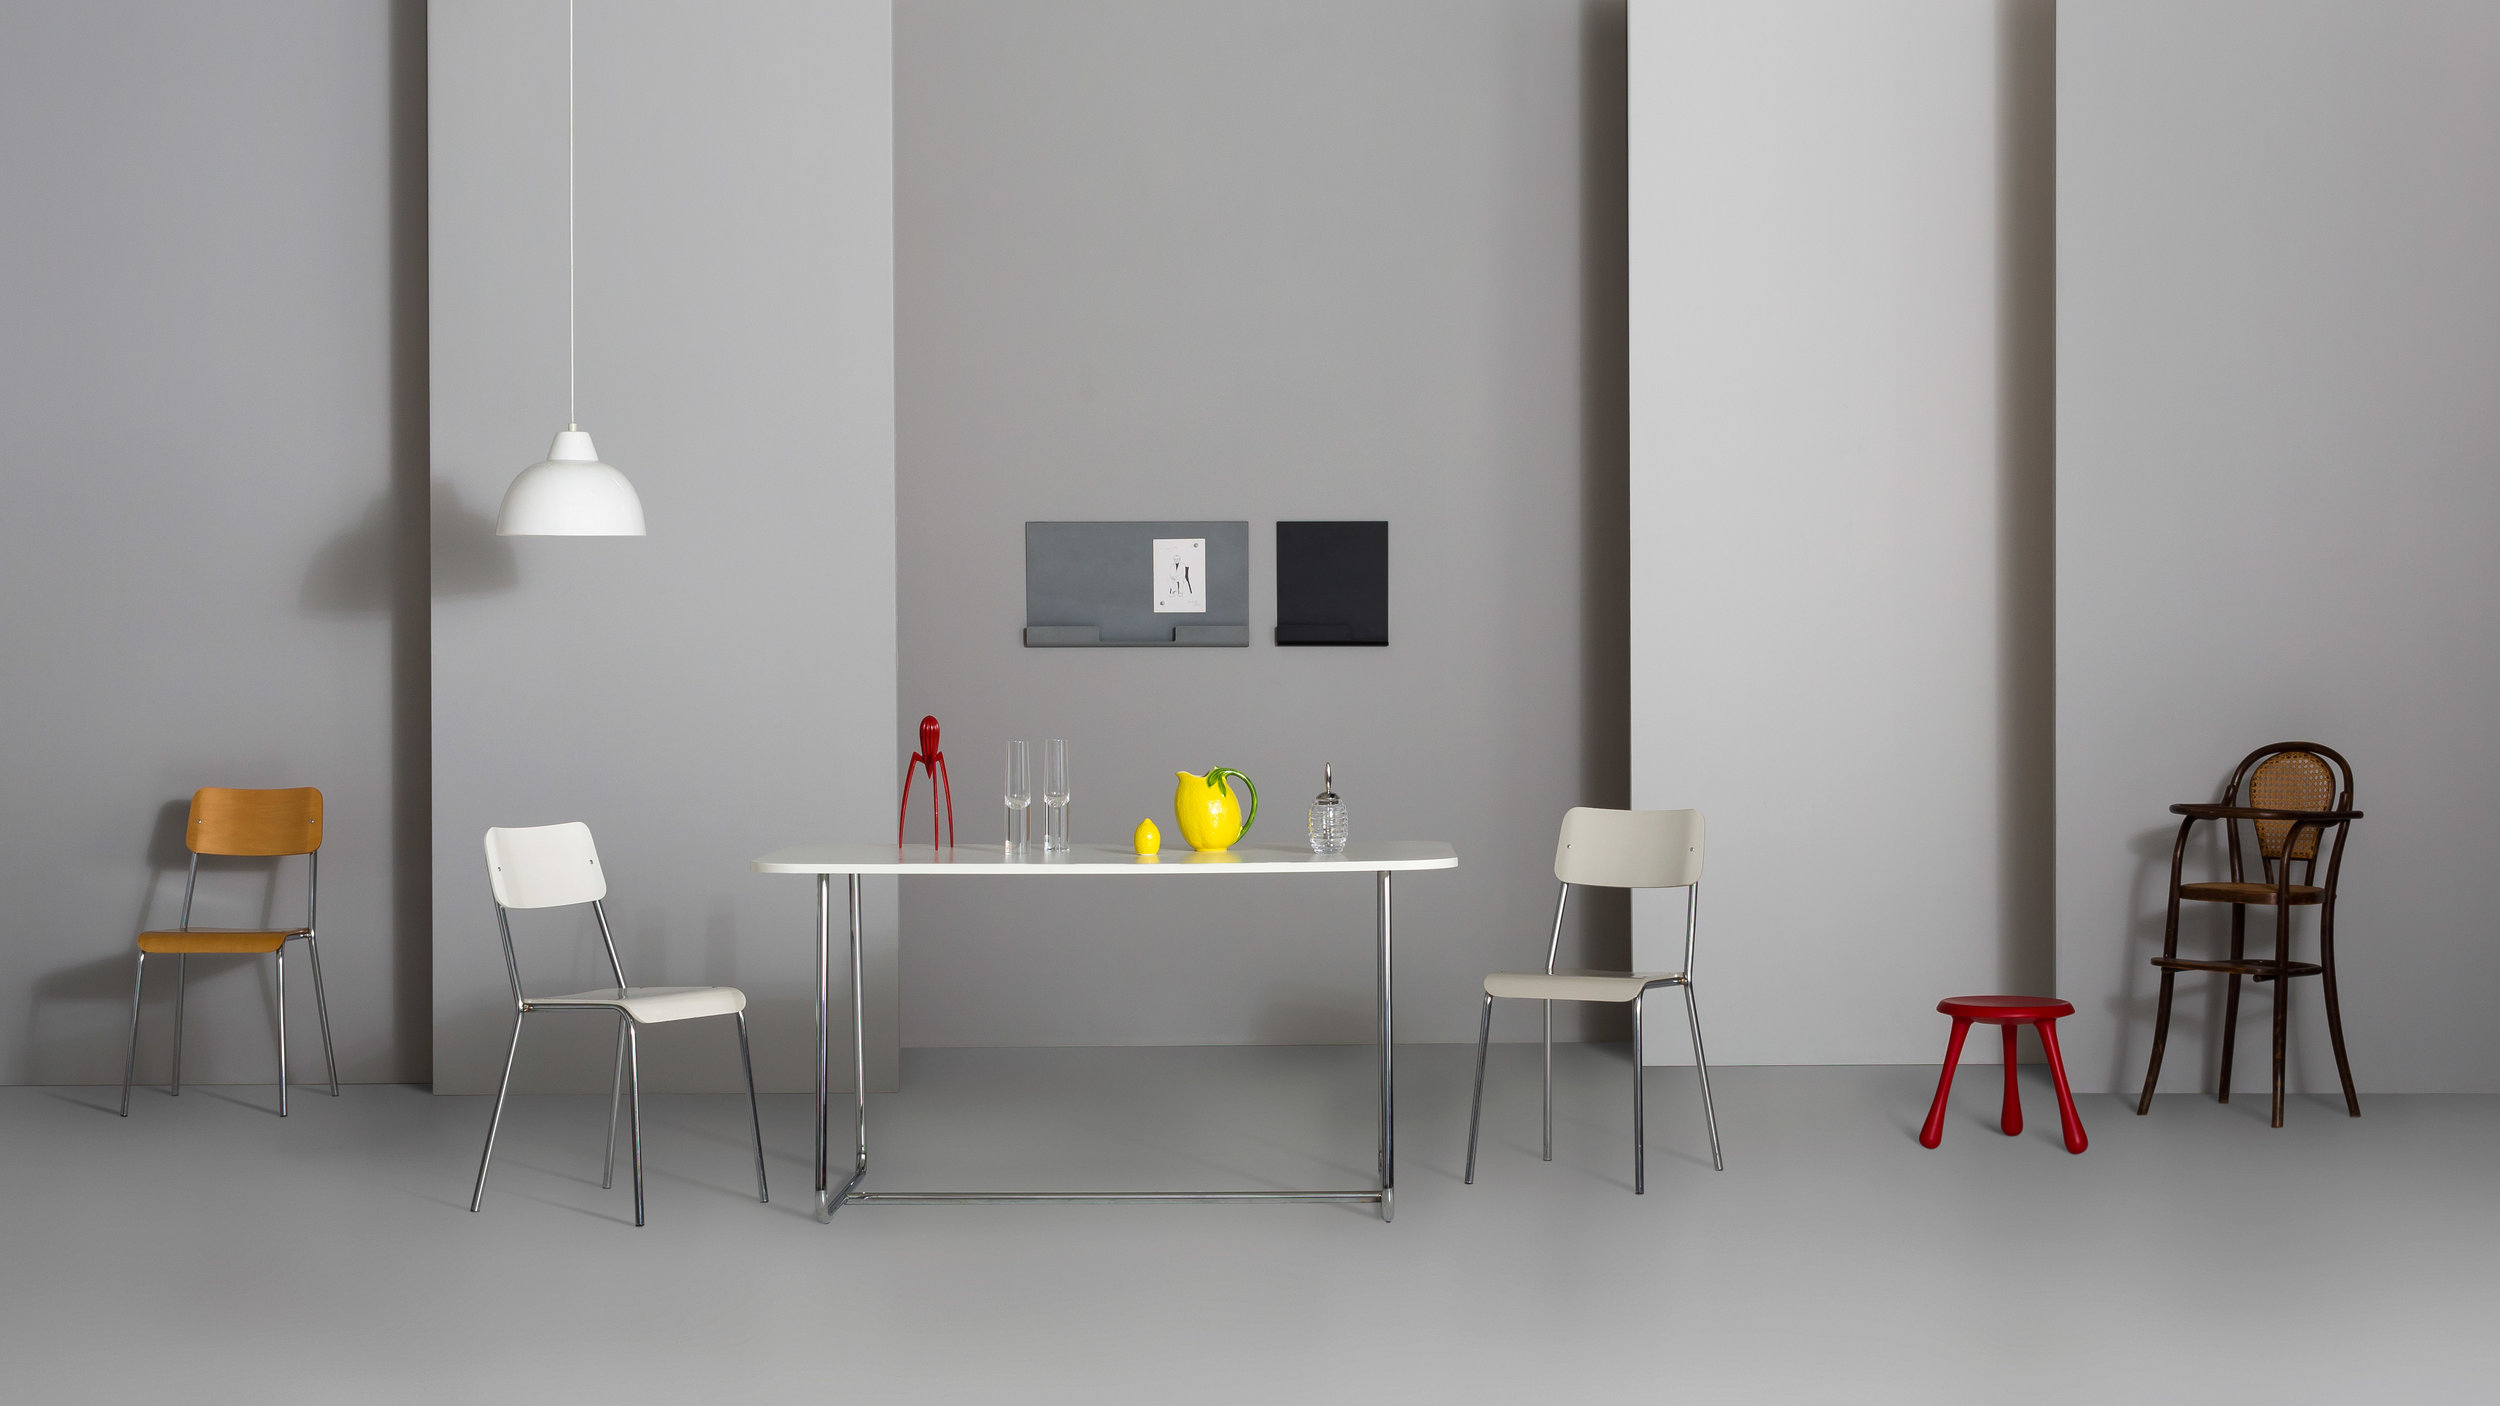 Theo-Williams-Product-Industrial-Design-Creative-Director.jpg